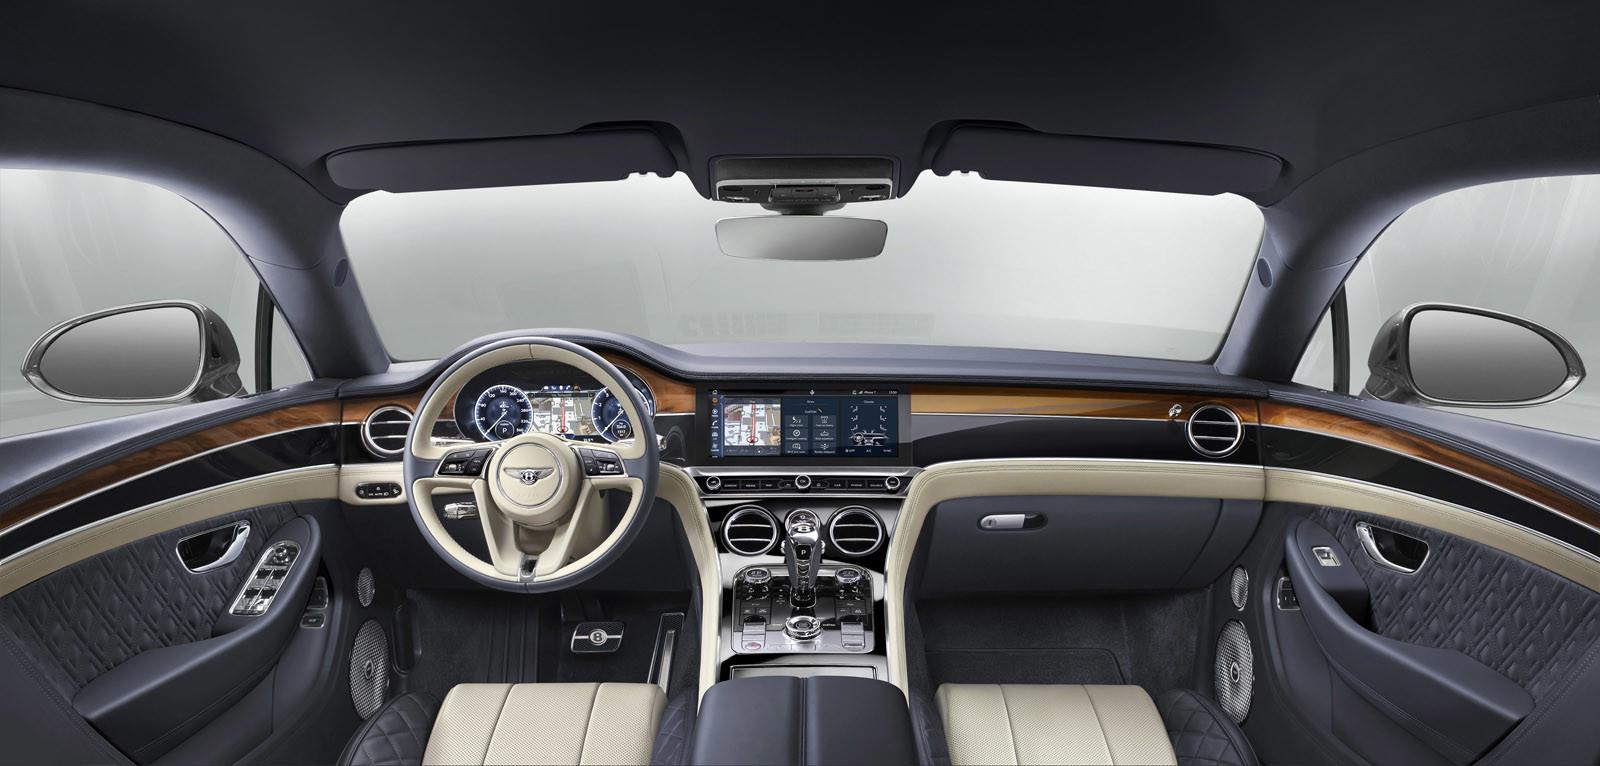 Foto de Bentley Continental GT 2018 (22/36)